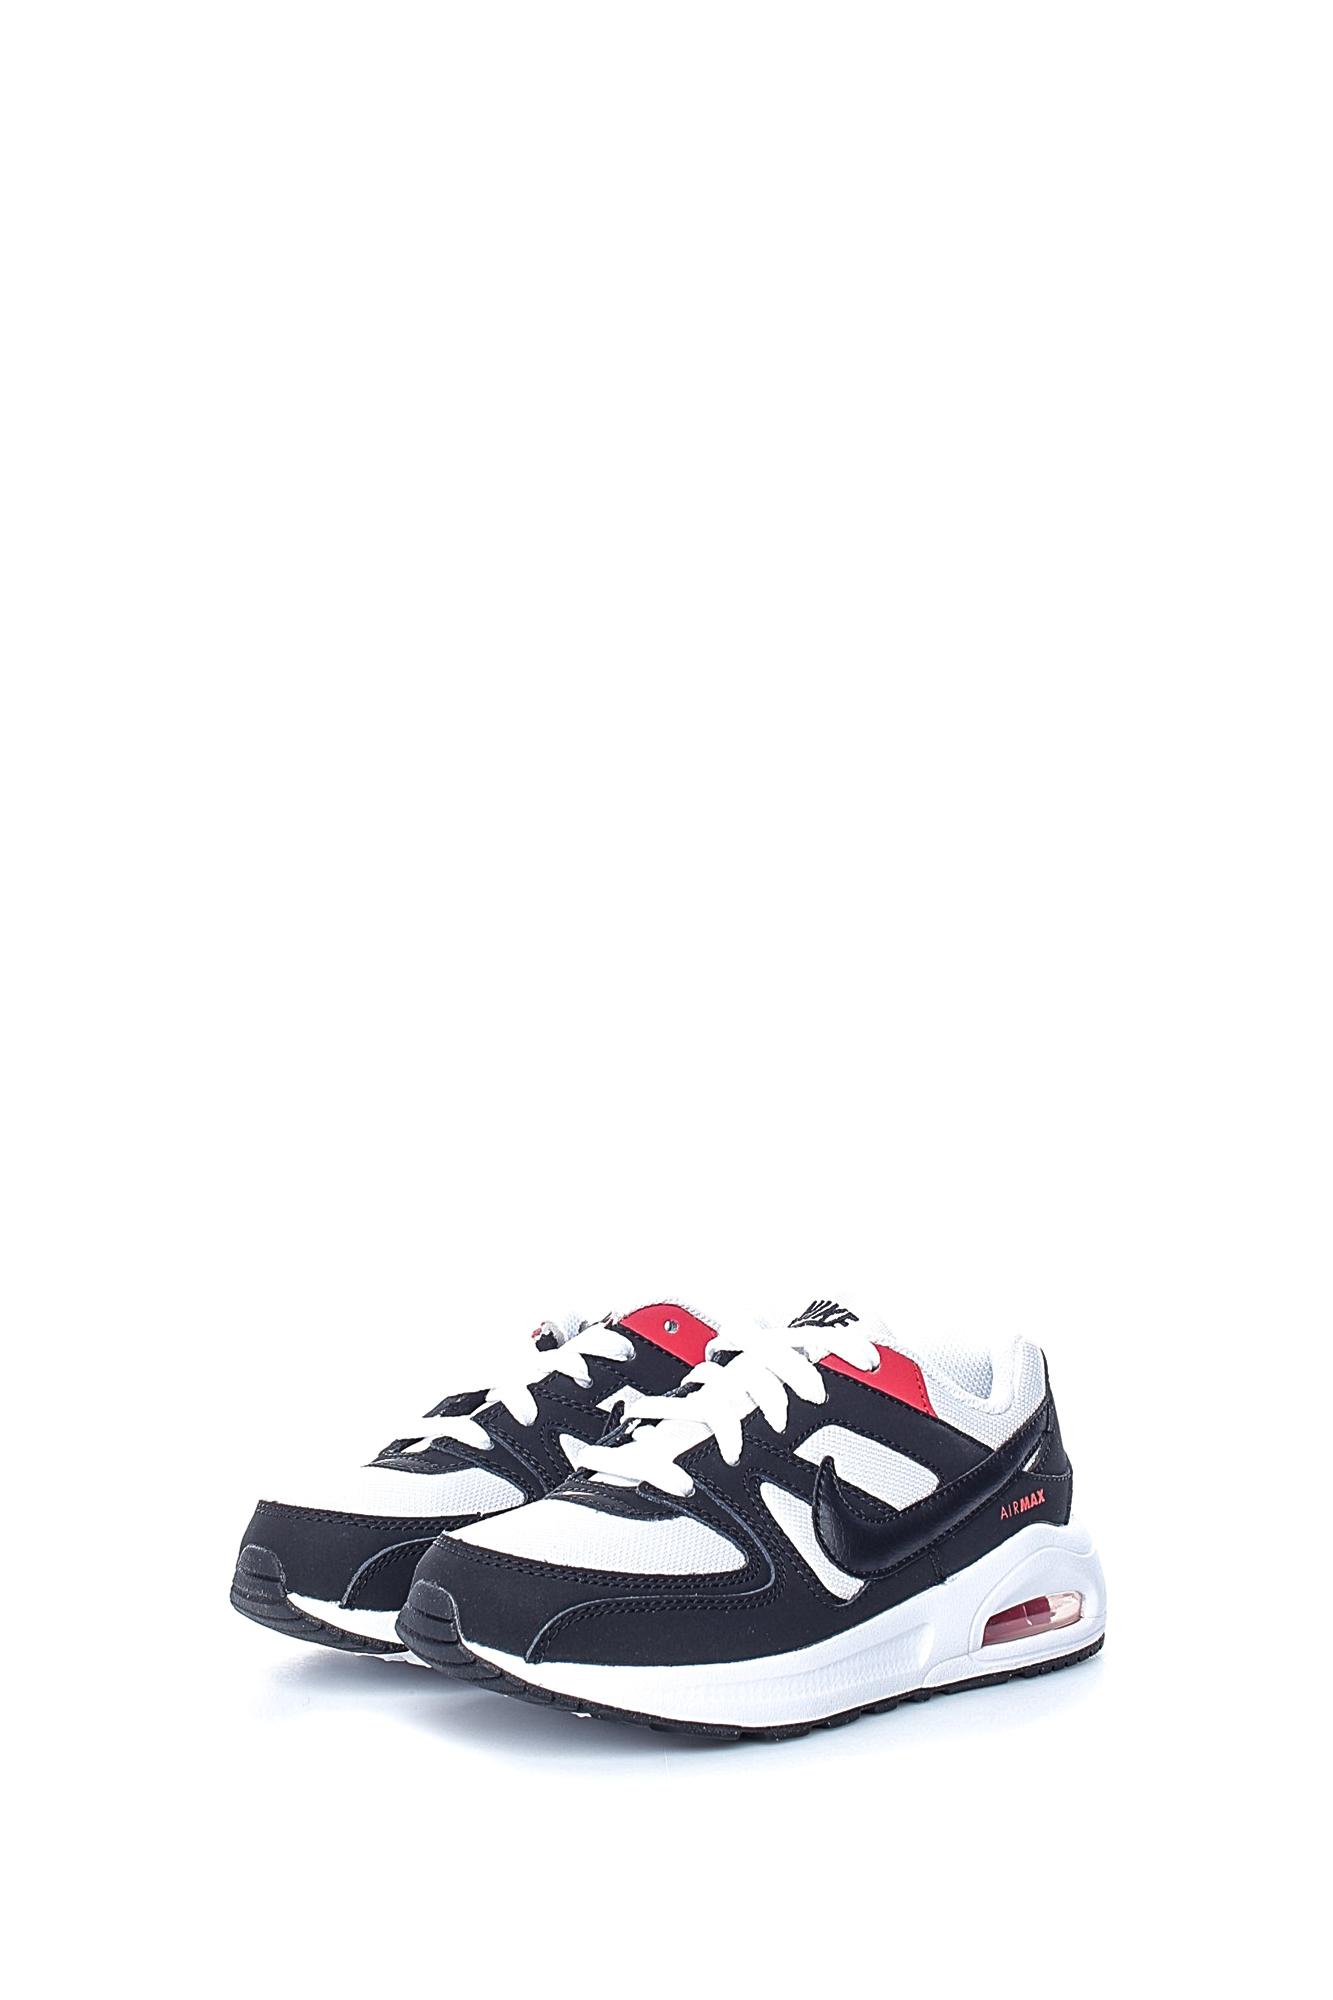 8a1fa60678b NIKE - Παιδικά αθλητικά παπούτσια Nike AIR MAX COMMAND FLEX (PS) μαύρα -  άσπρα, ΠΑΙΔΙ | ΠΑΠΟΥΤΣΙΑ | ΑΘΛΗΤΙΚΑ